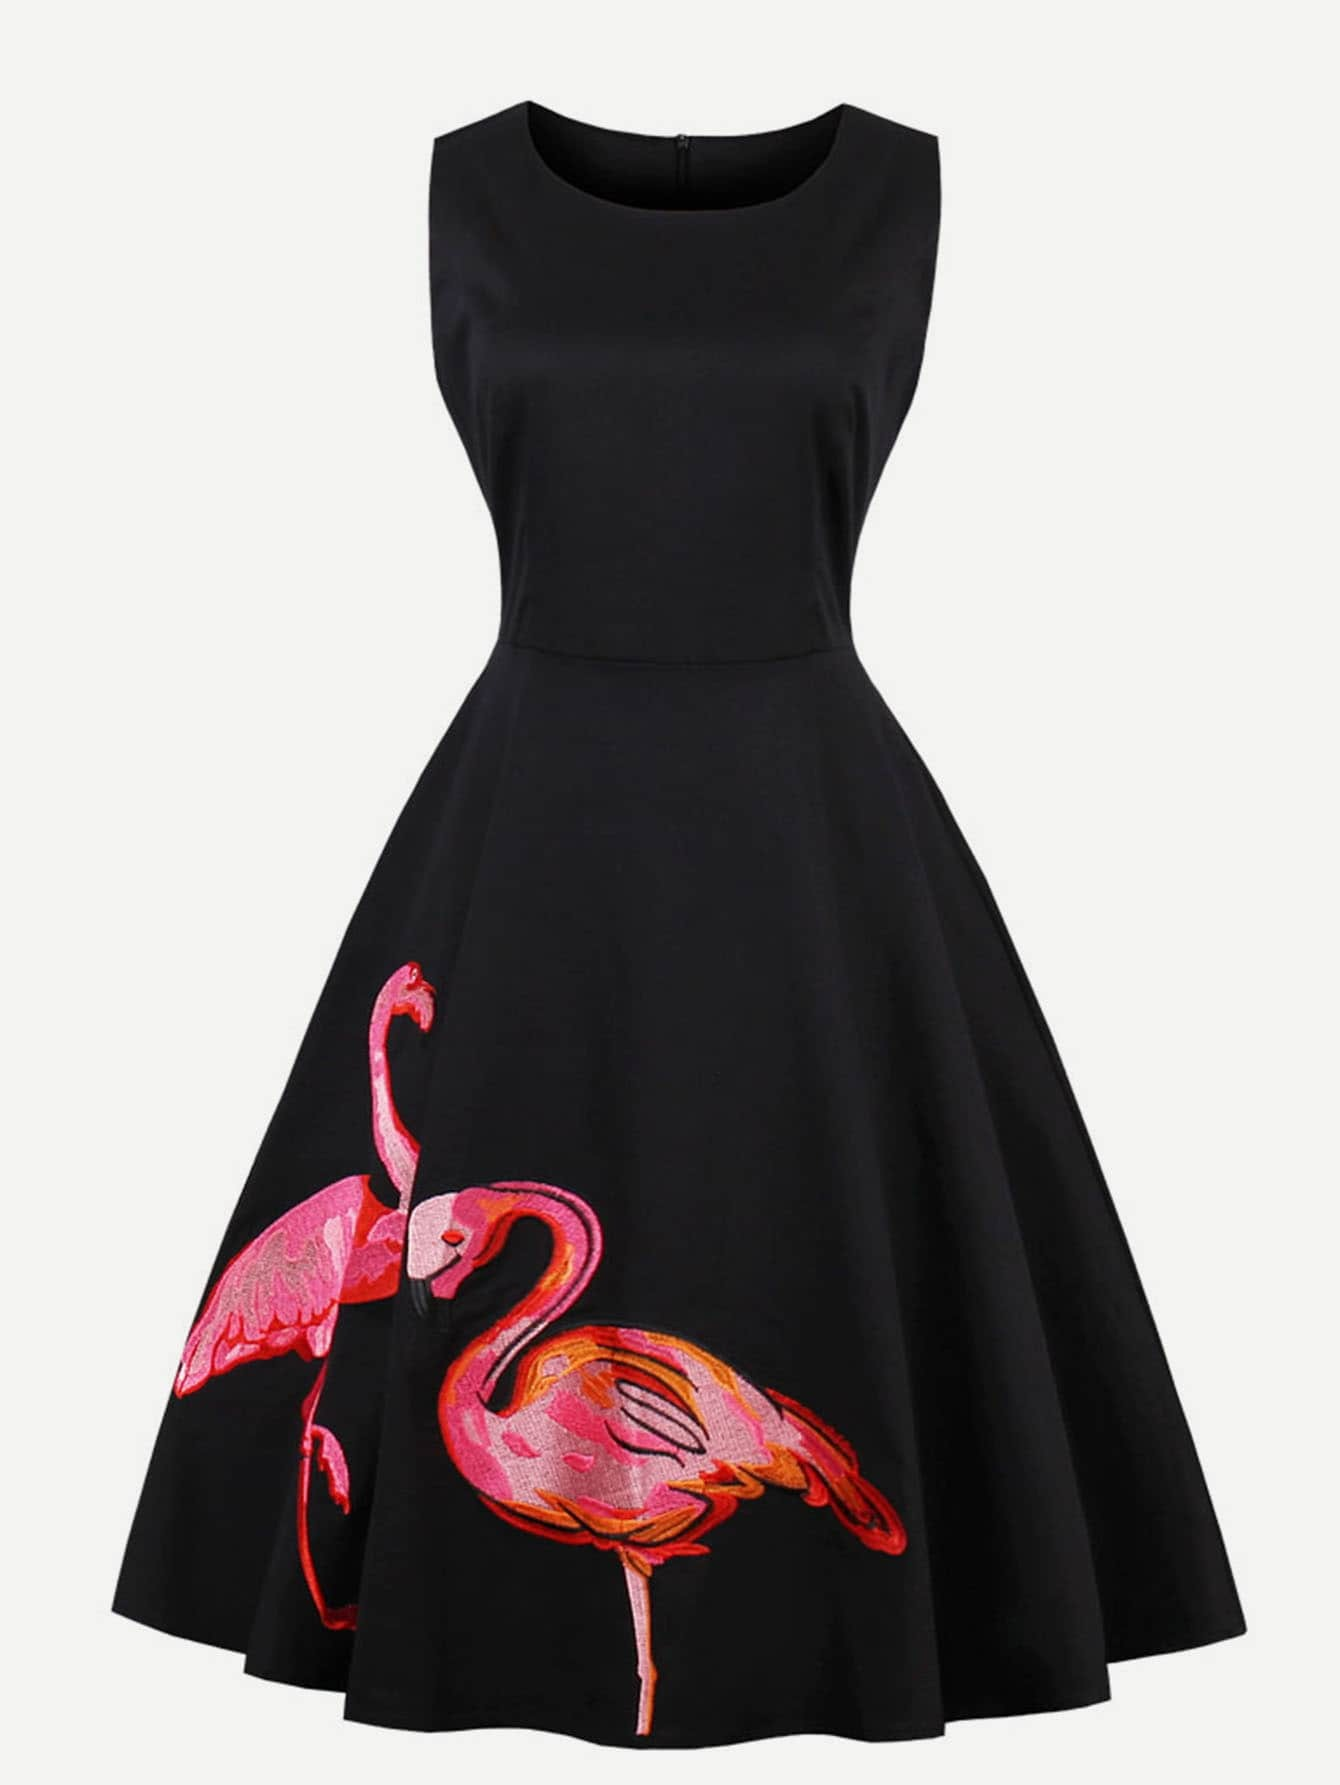 Flamingo Embroidered Swing Dress long sleeve embroidered swing dress